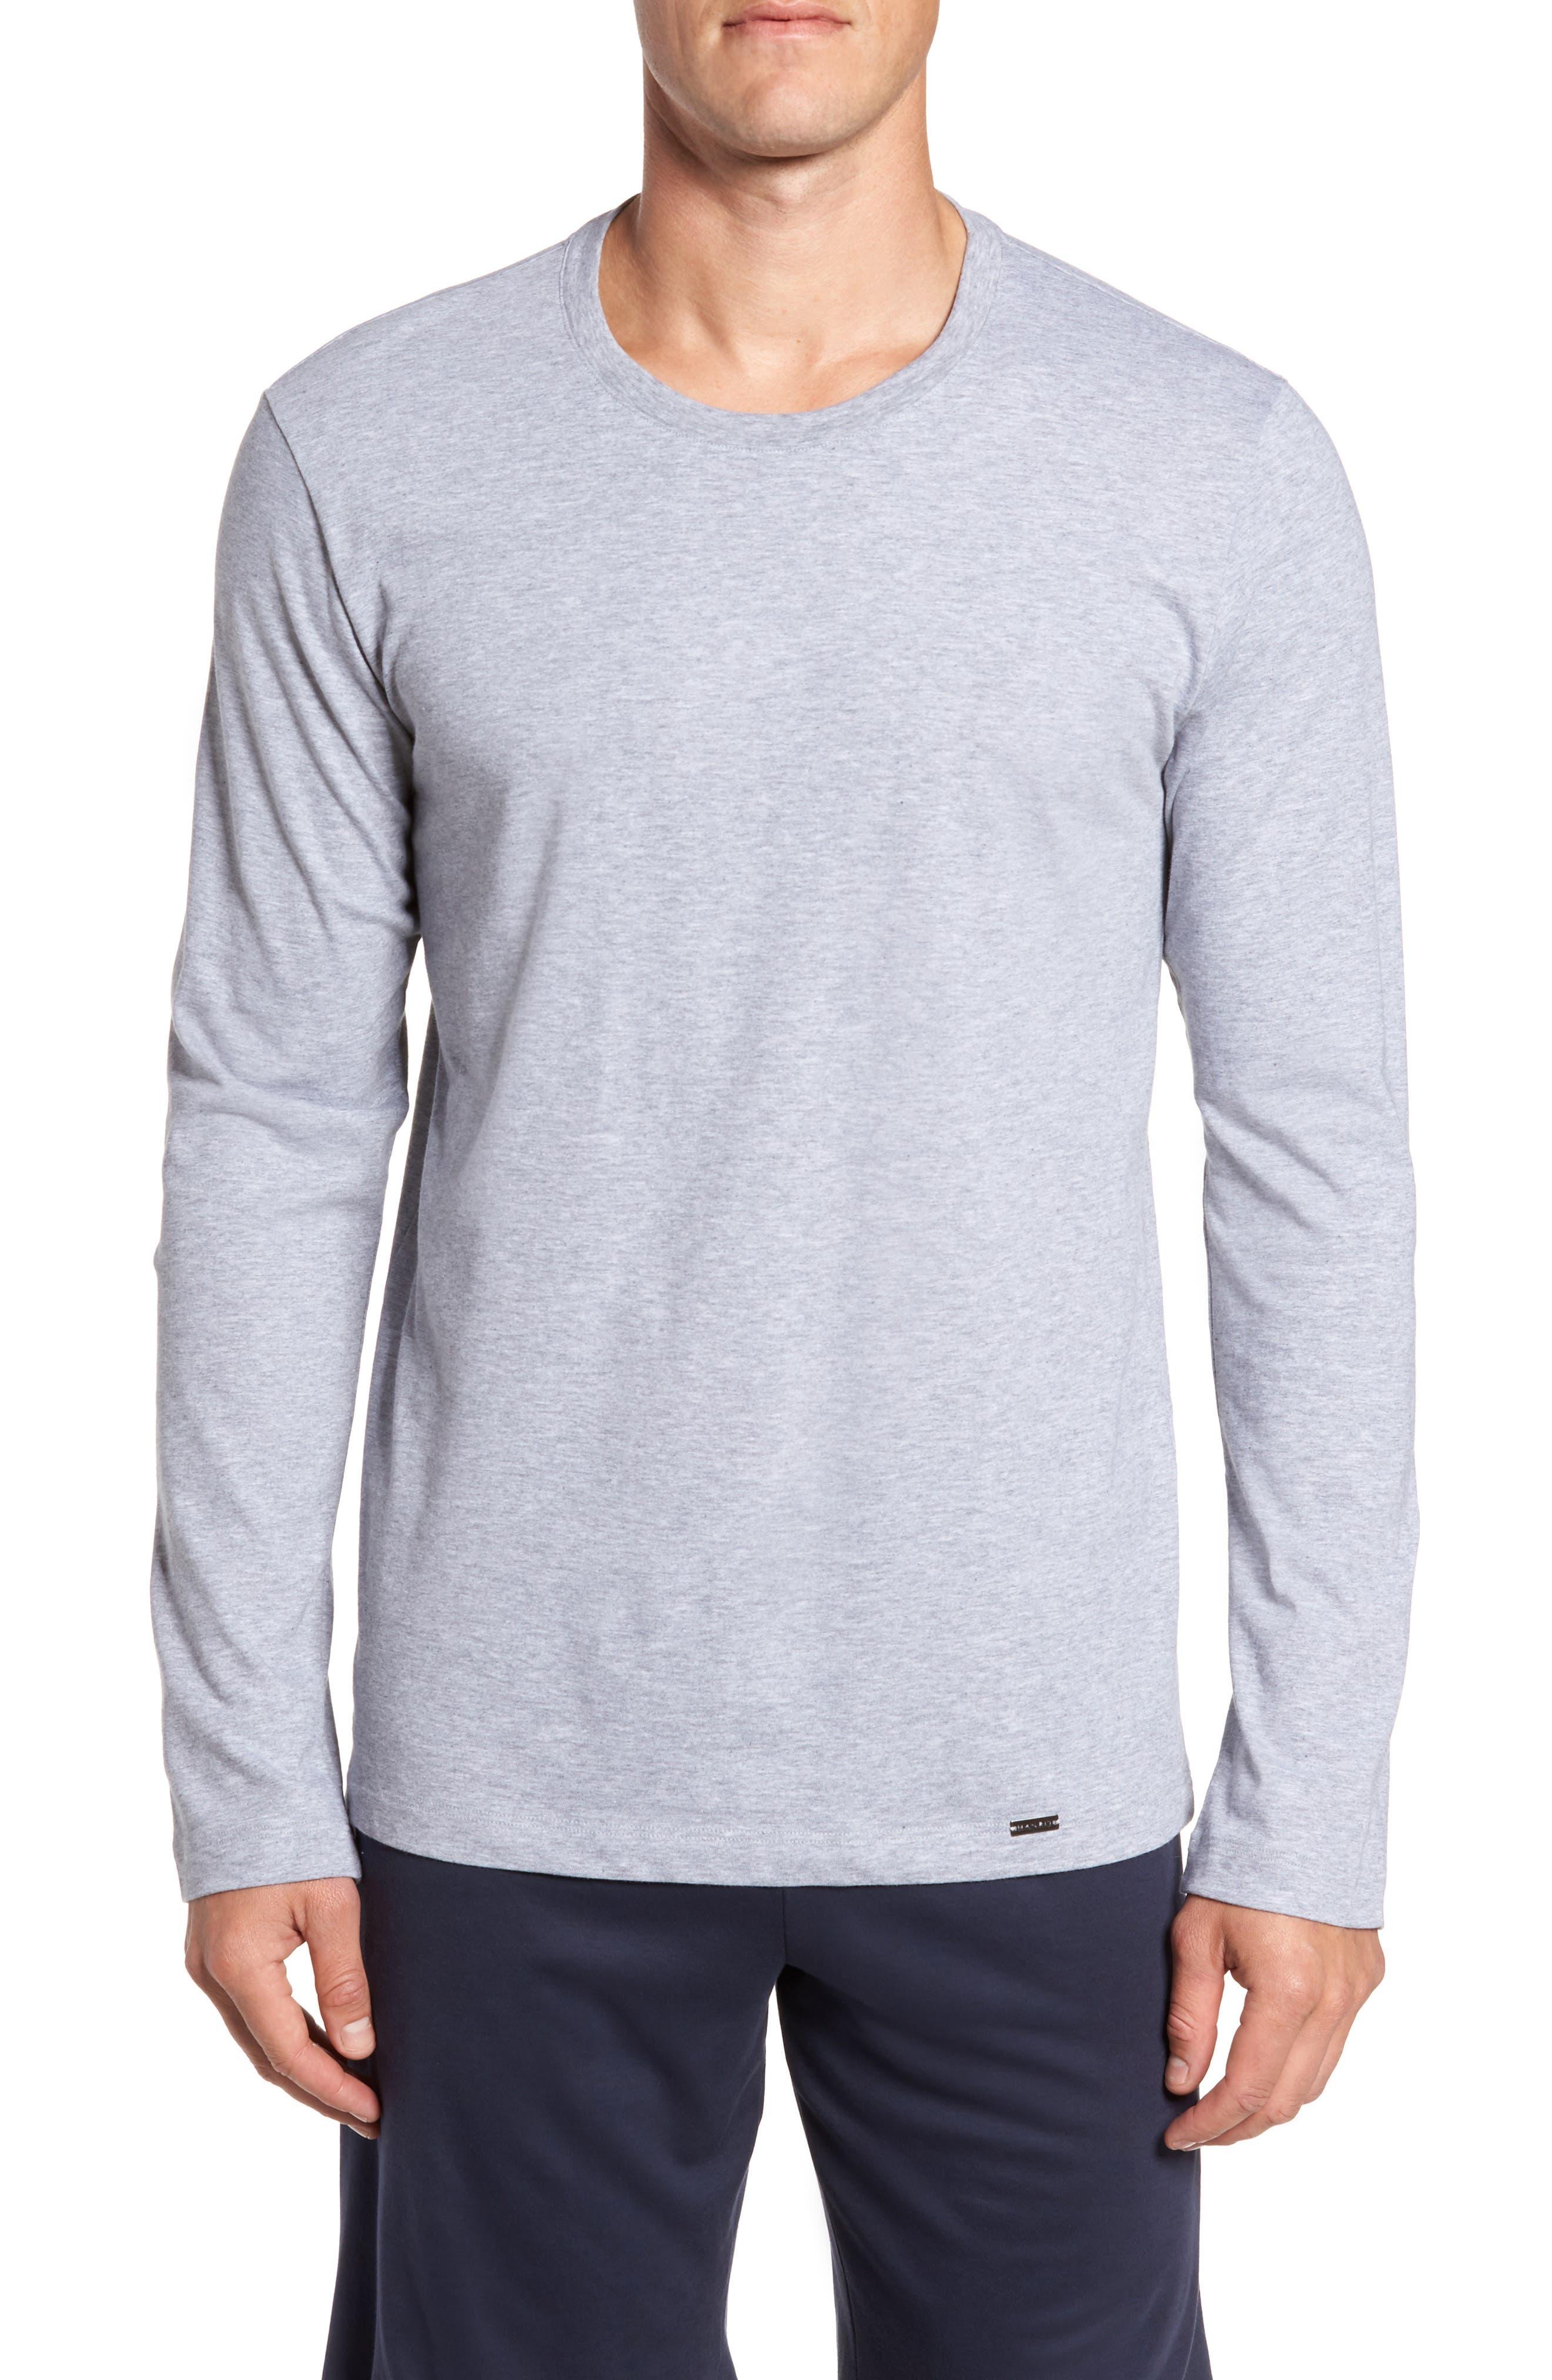 Main Image - Hanro Living Long Sleeve T-Shirt